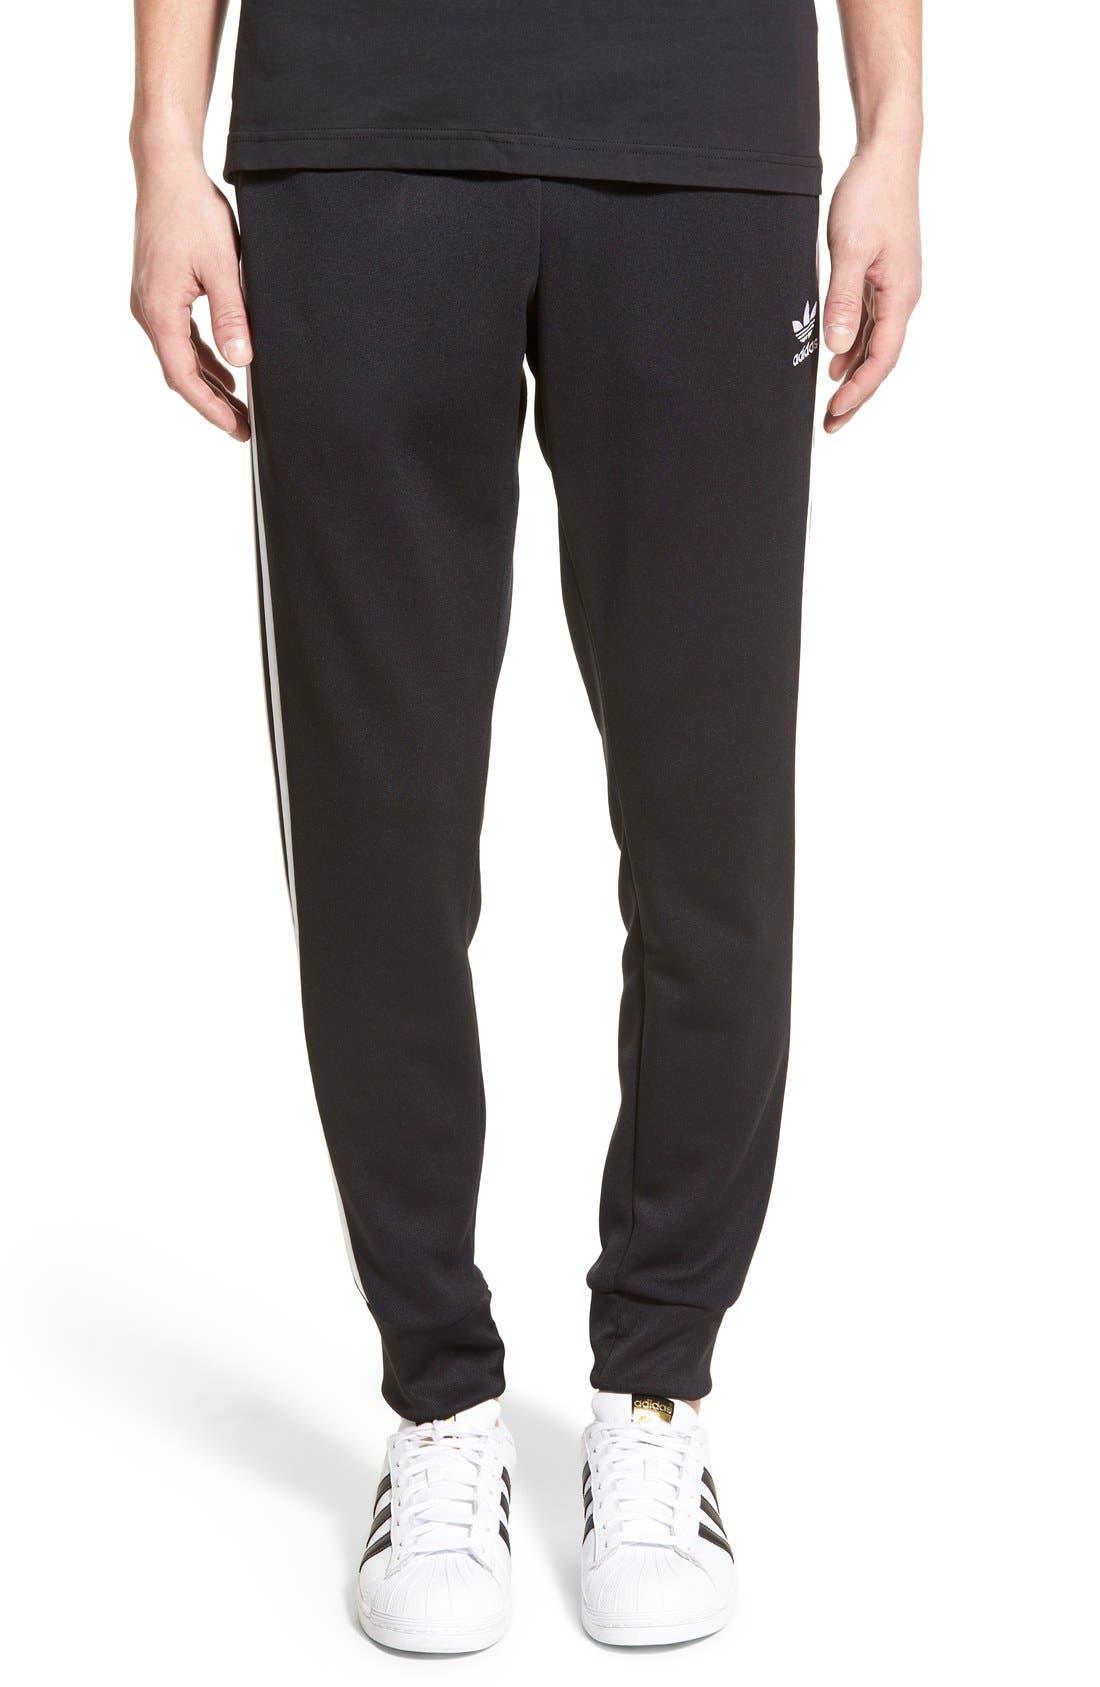 adidas Originals 'Superstar' Track Pants